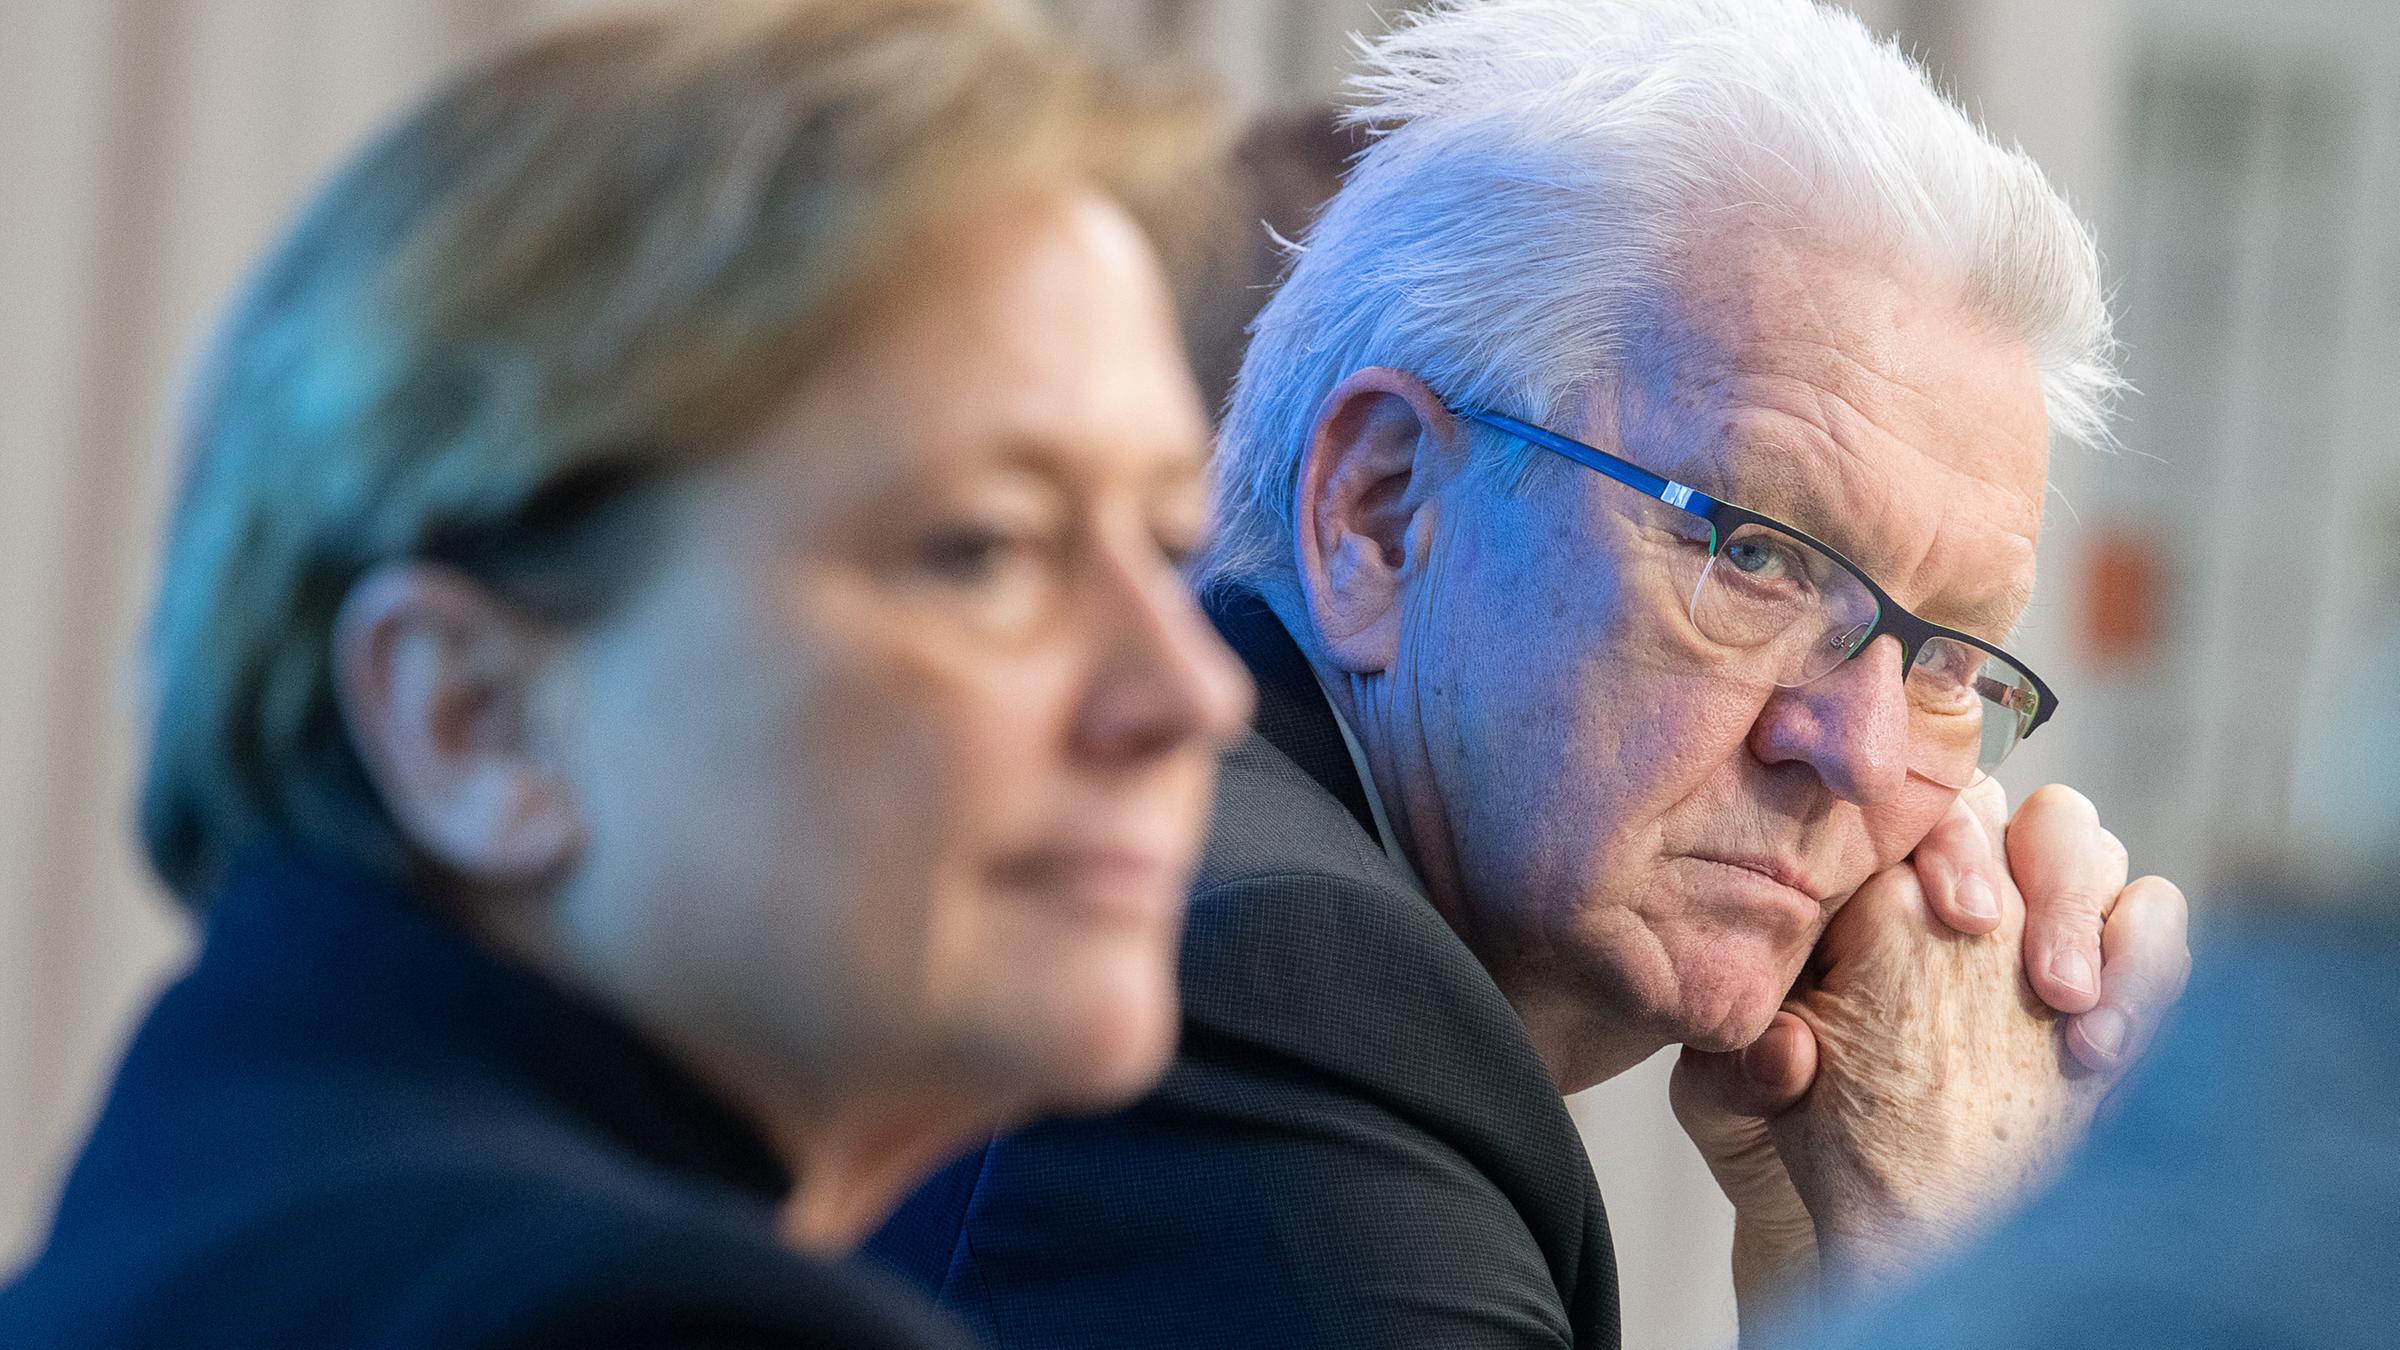 Landtagswahl Baden Wurttemberg Wahlkampf Im Krisenmodus Zdfheute